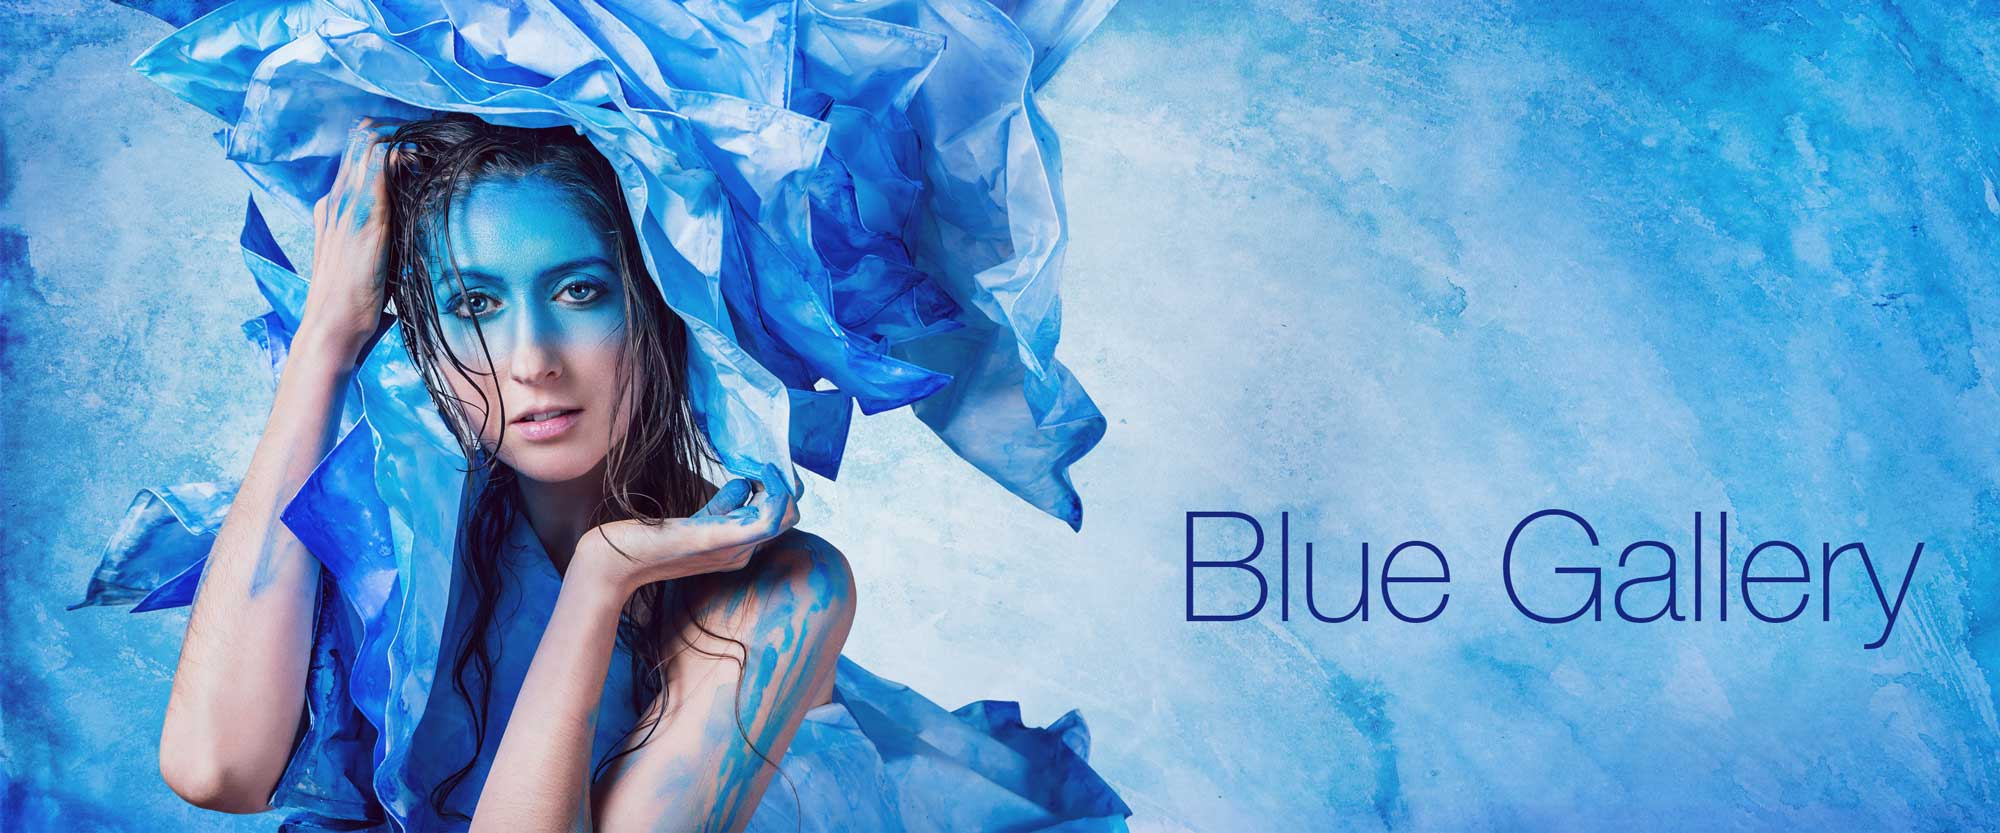 Laüra Hollick's Blue Gallery